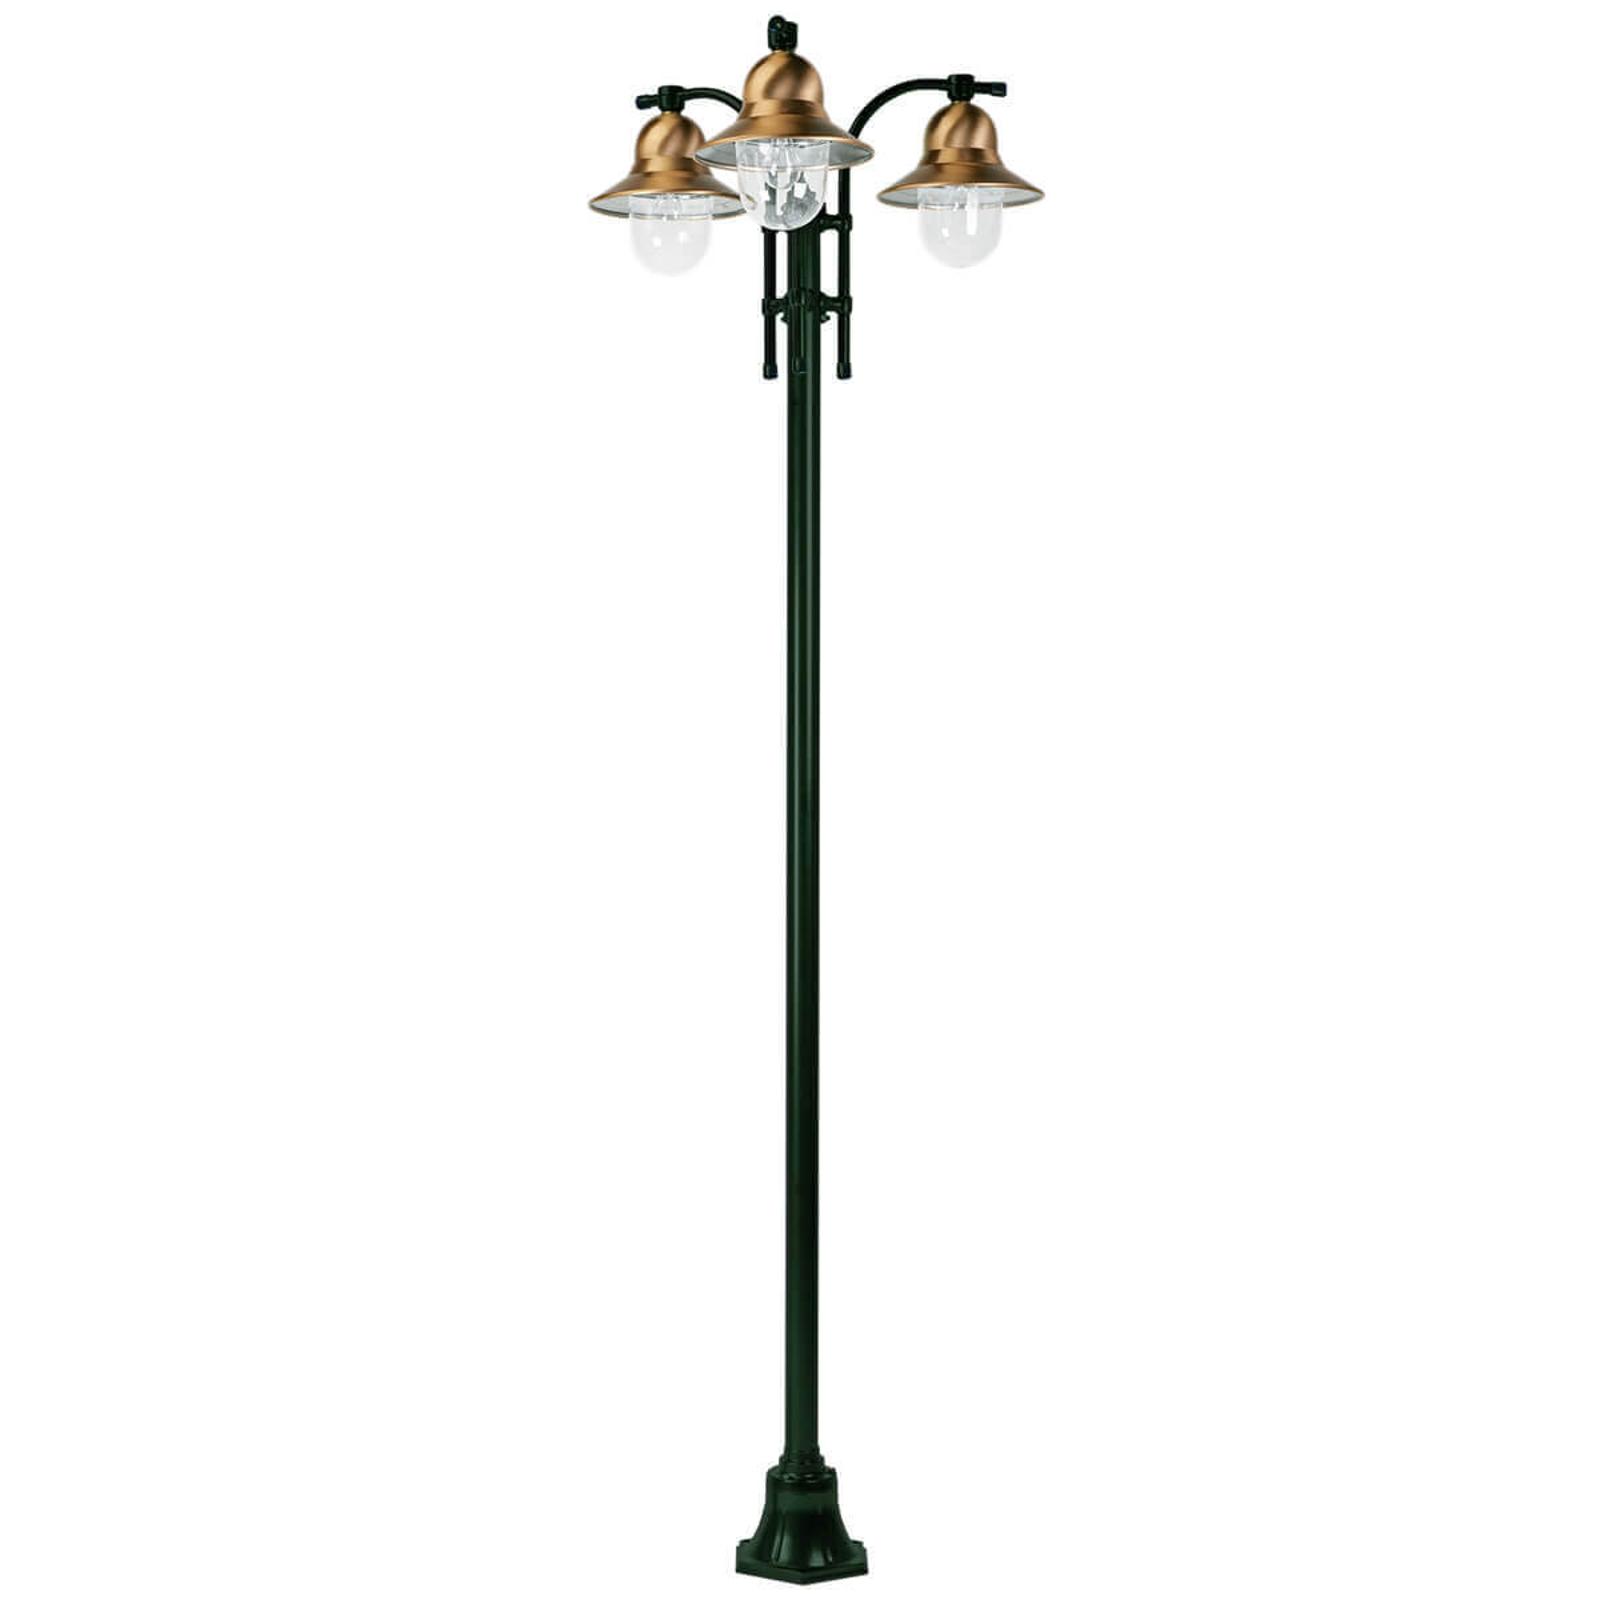 3-punktowa latarnia Toscane, zielona